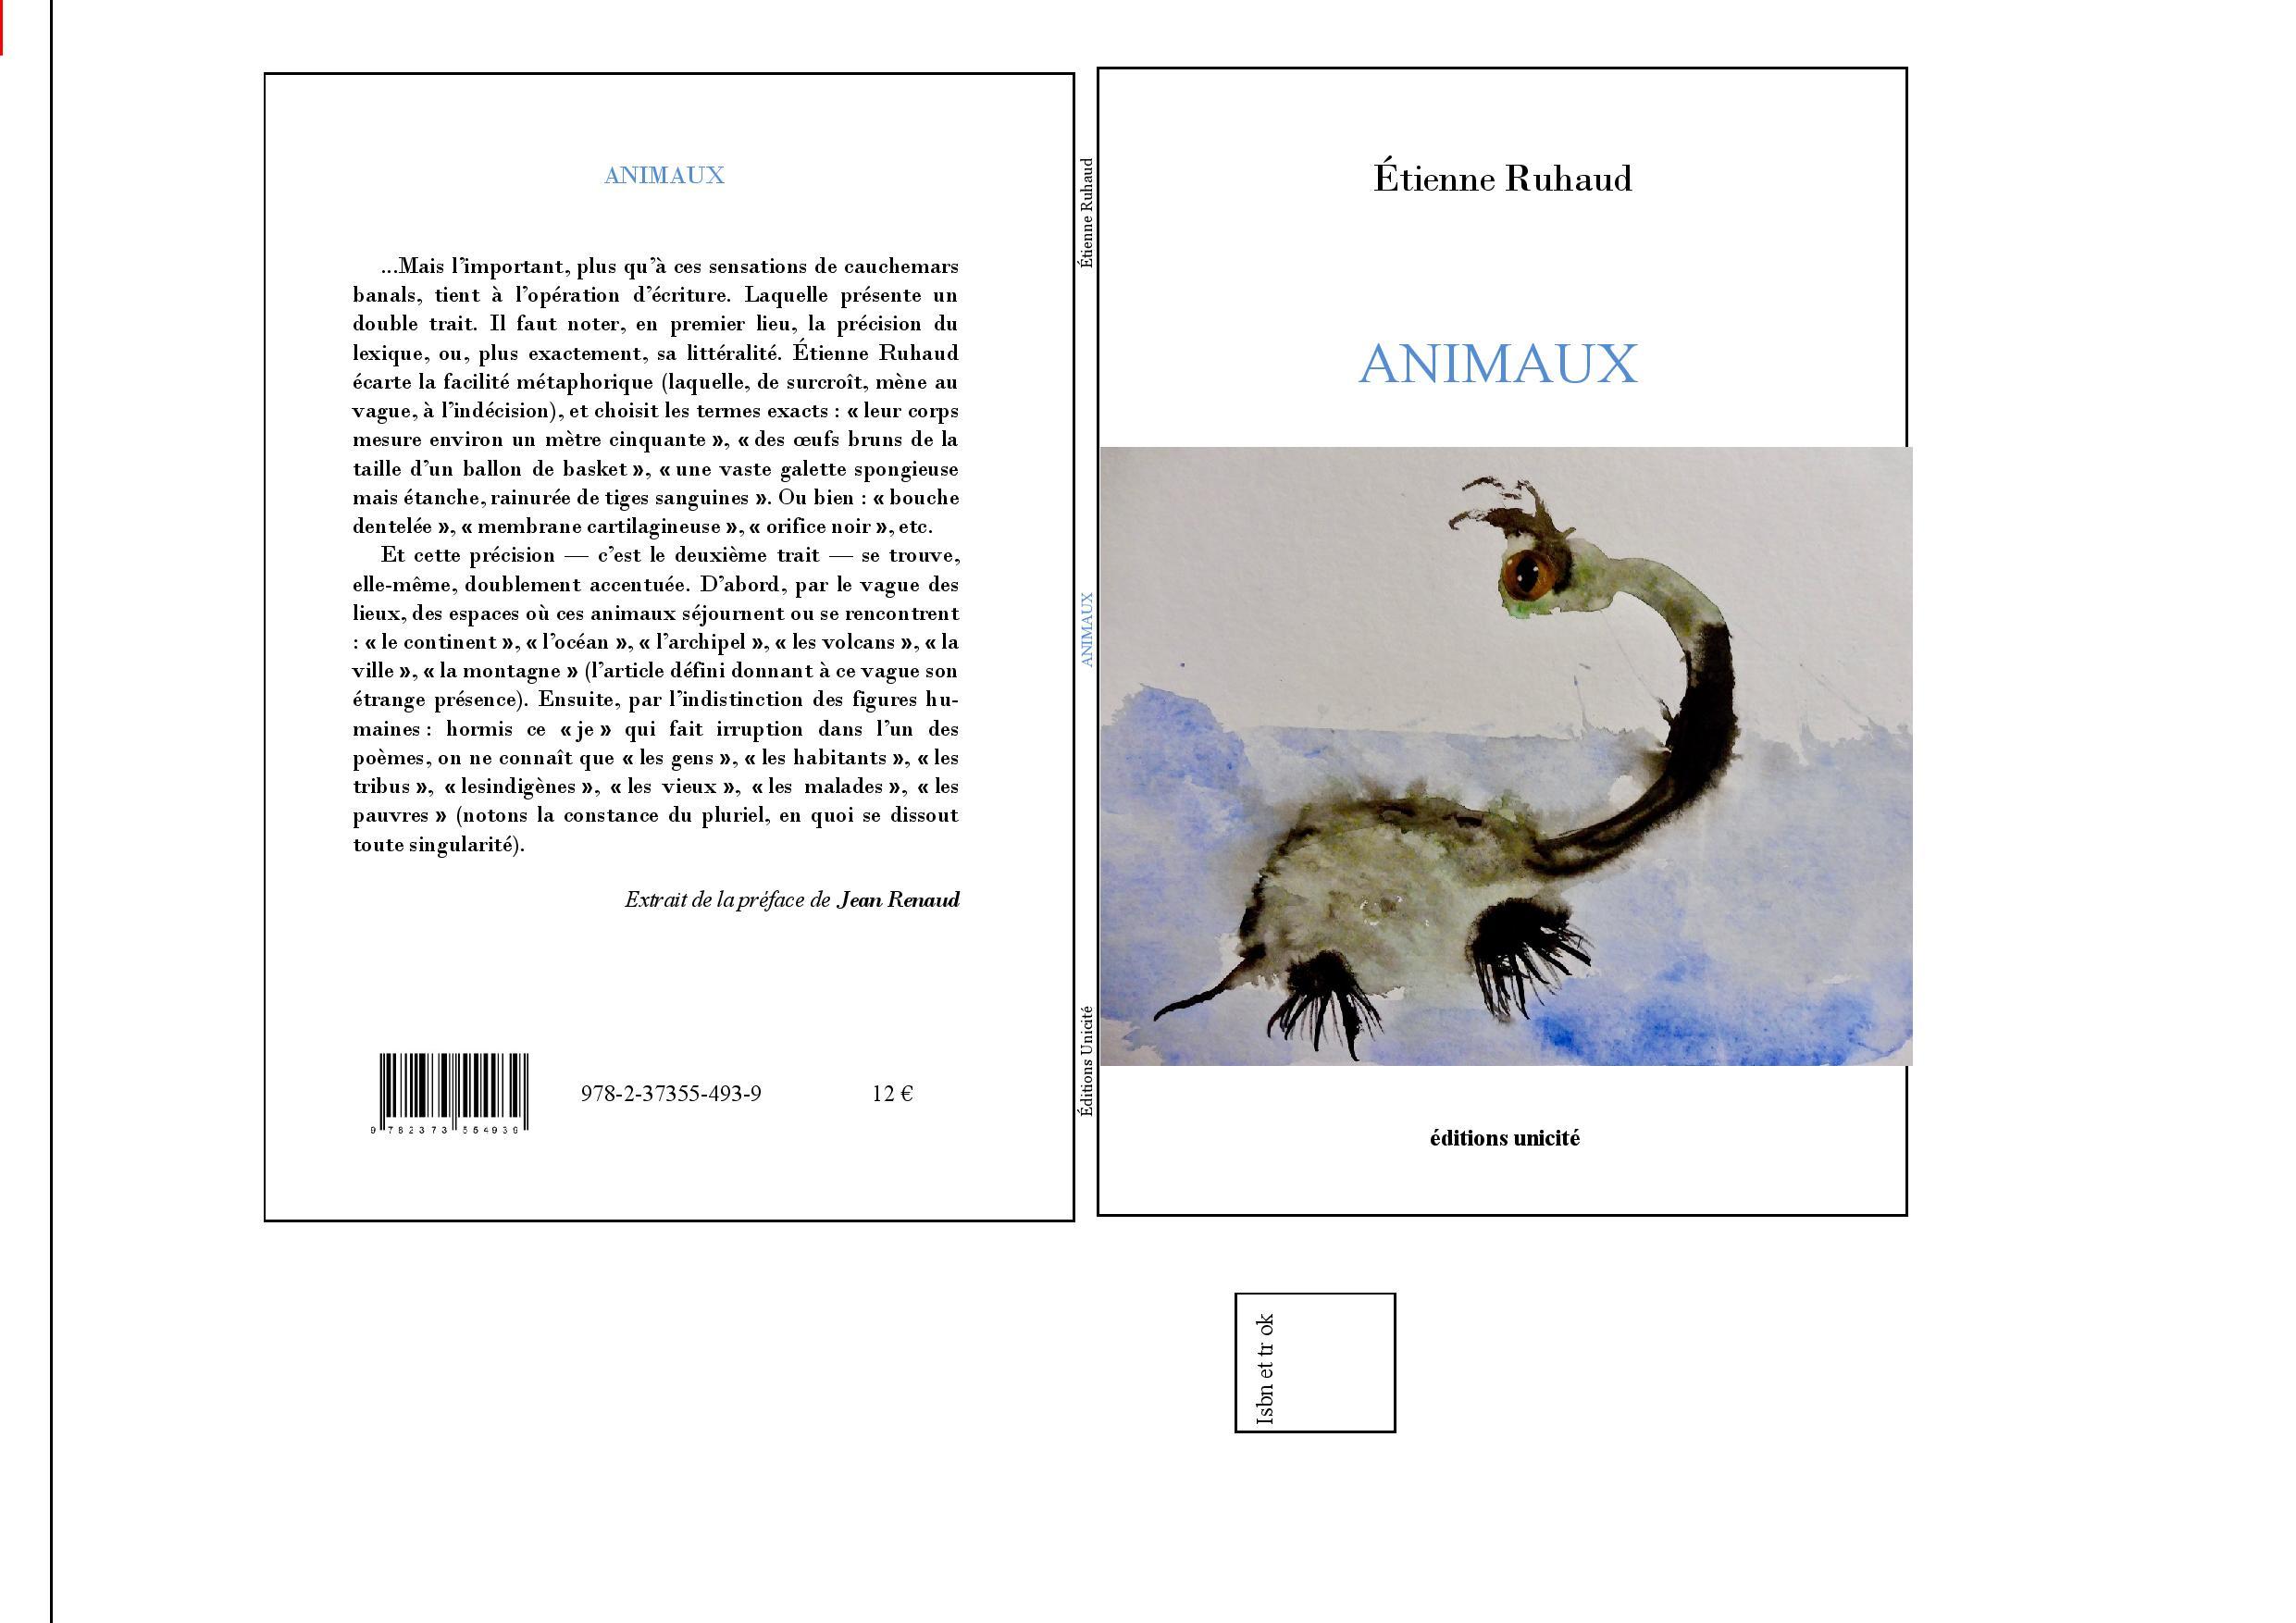 okcouvétienne- Copie-5-page-001(1)